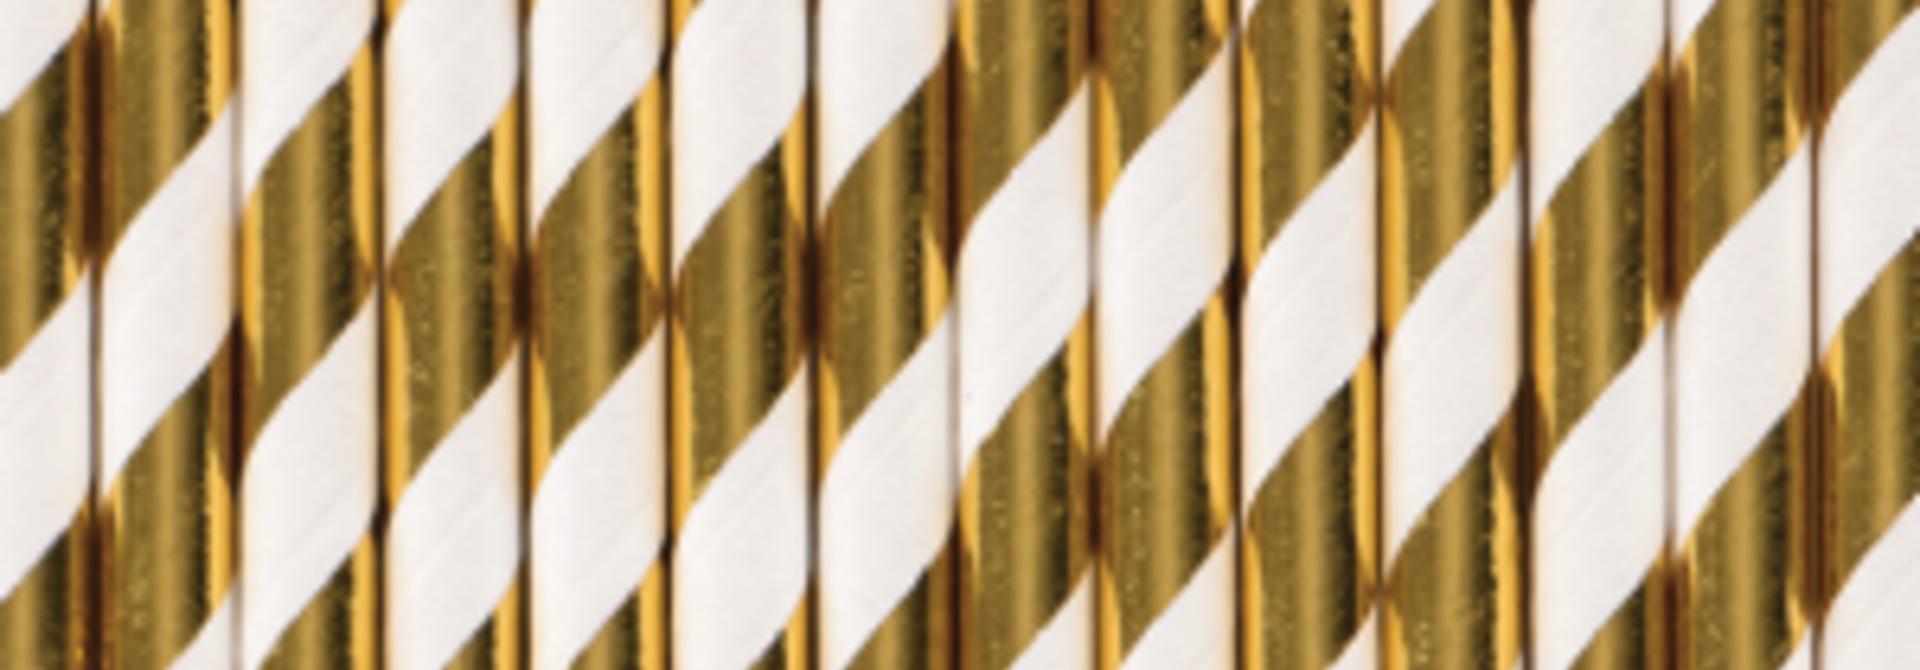 Papieren rietjes gestreept goud folie